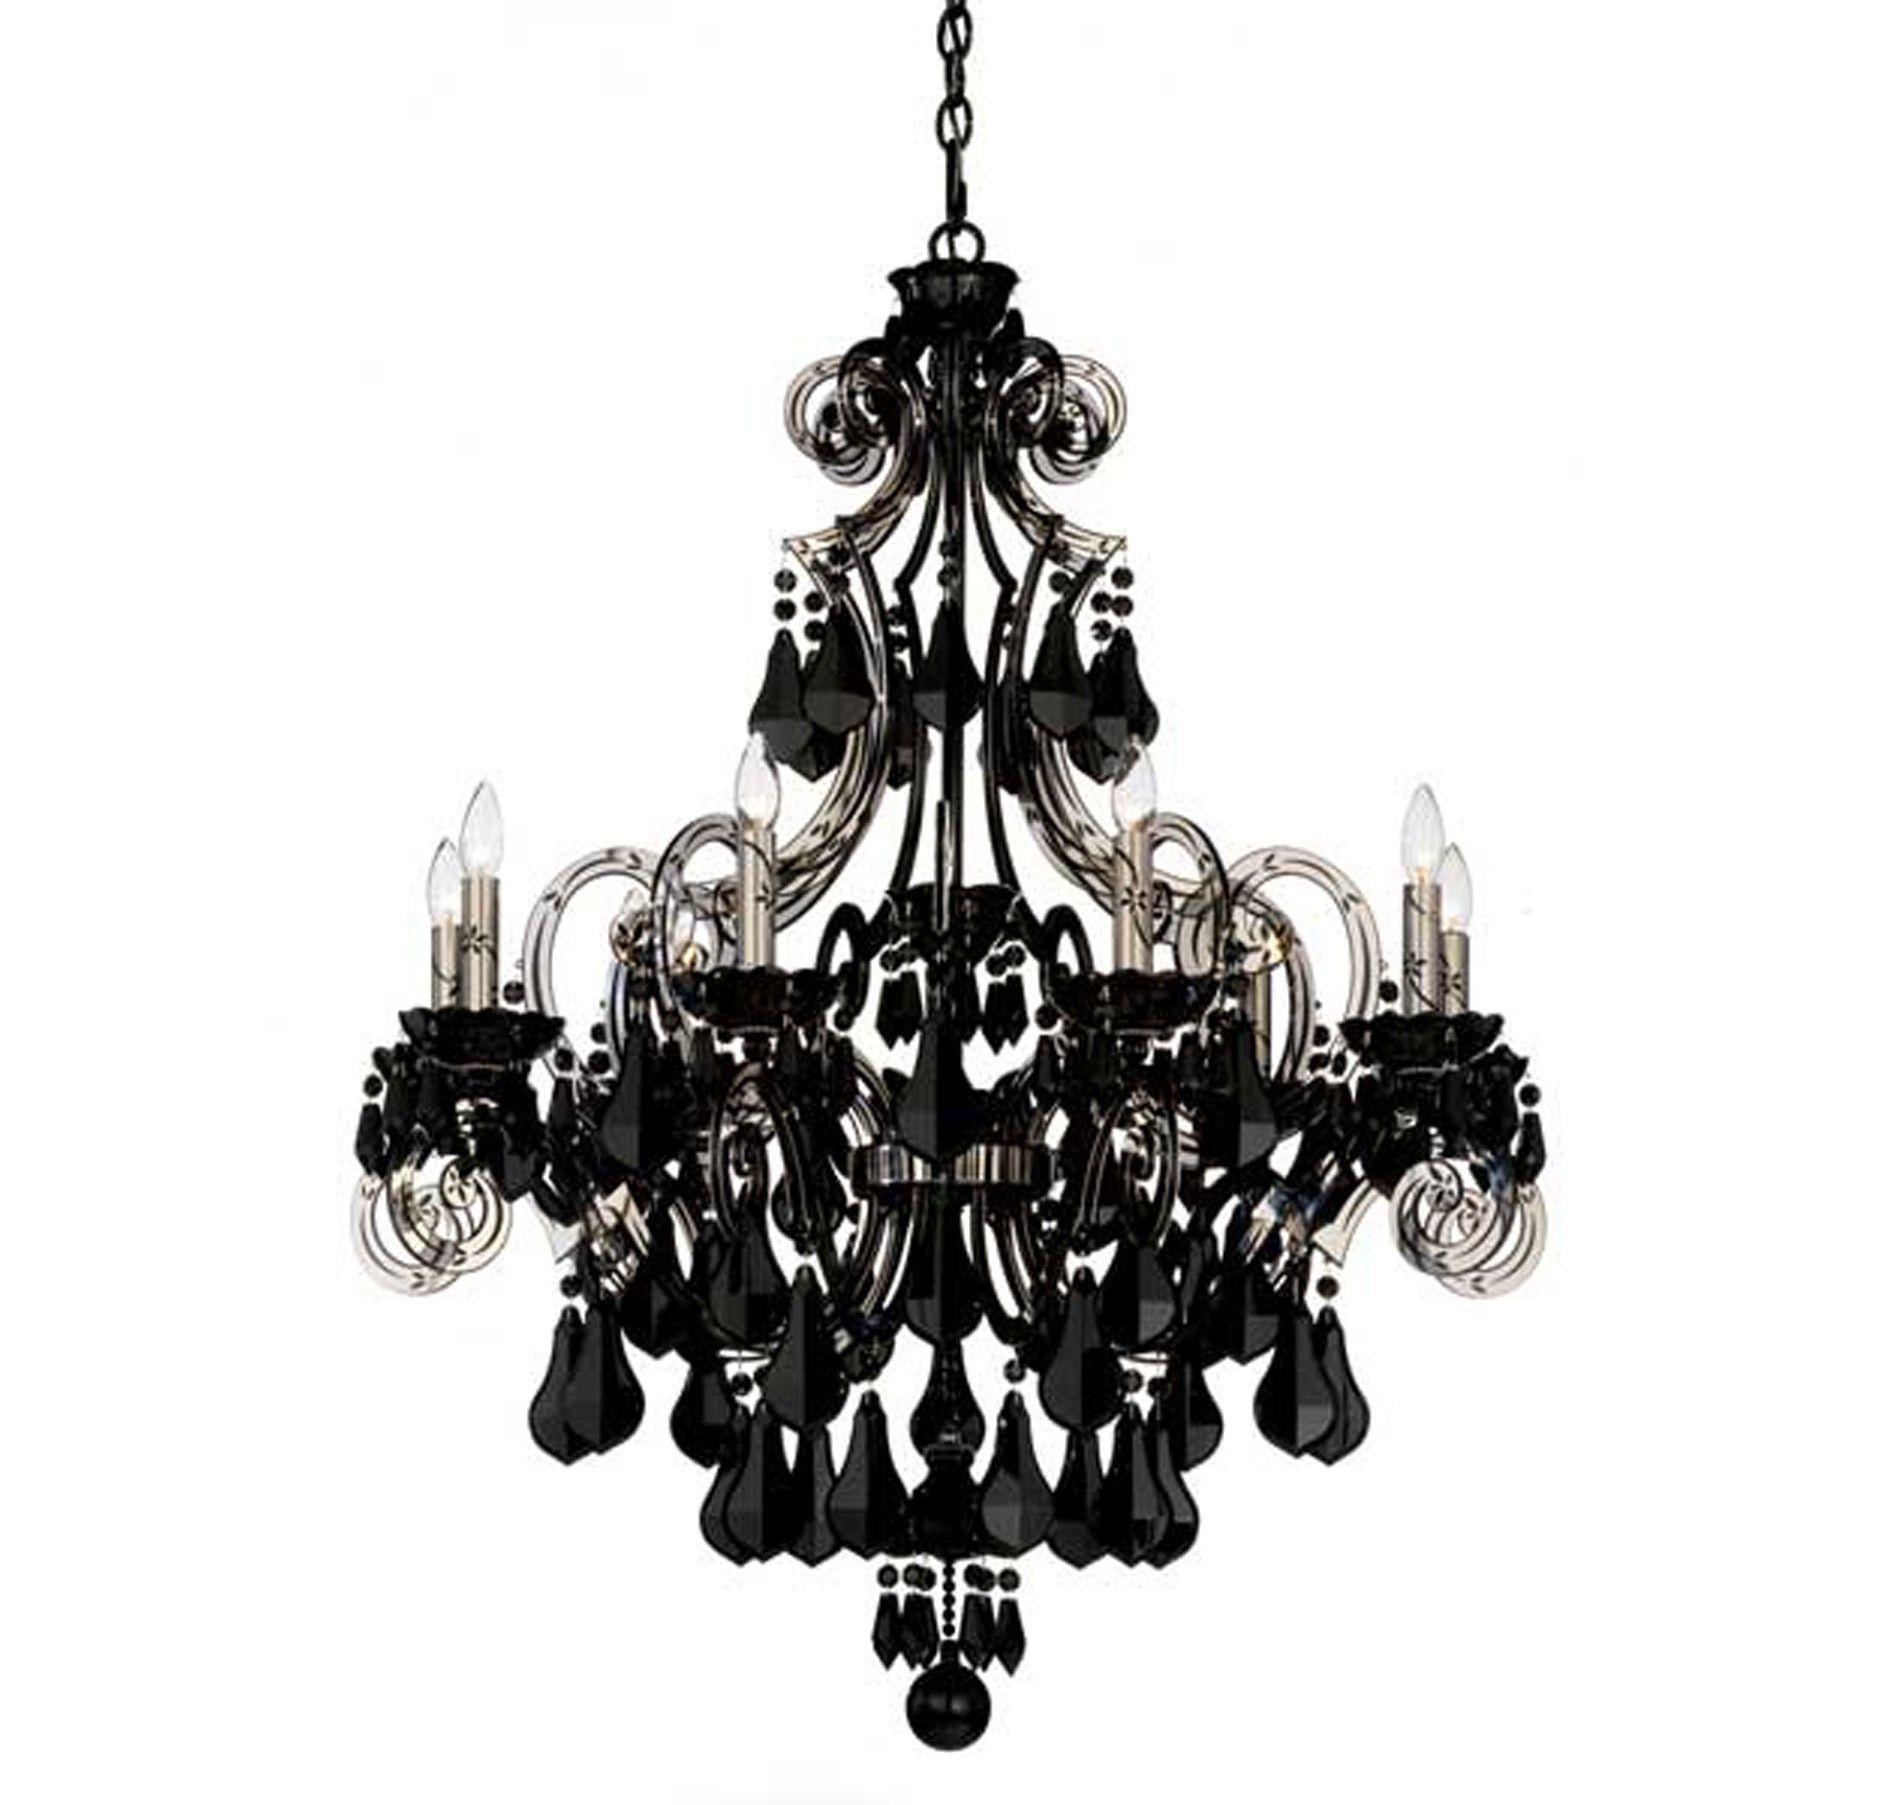 6739 55bk1perzoomg 18901805 pixels home pinterest schonbek cappela 9 light black chandelier aloadofball Images